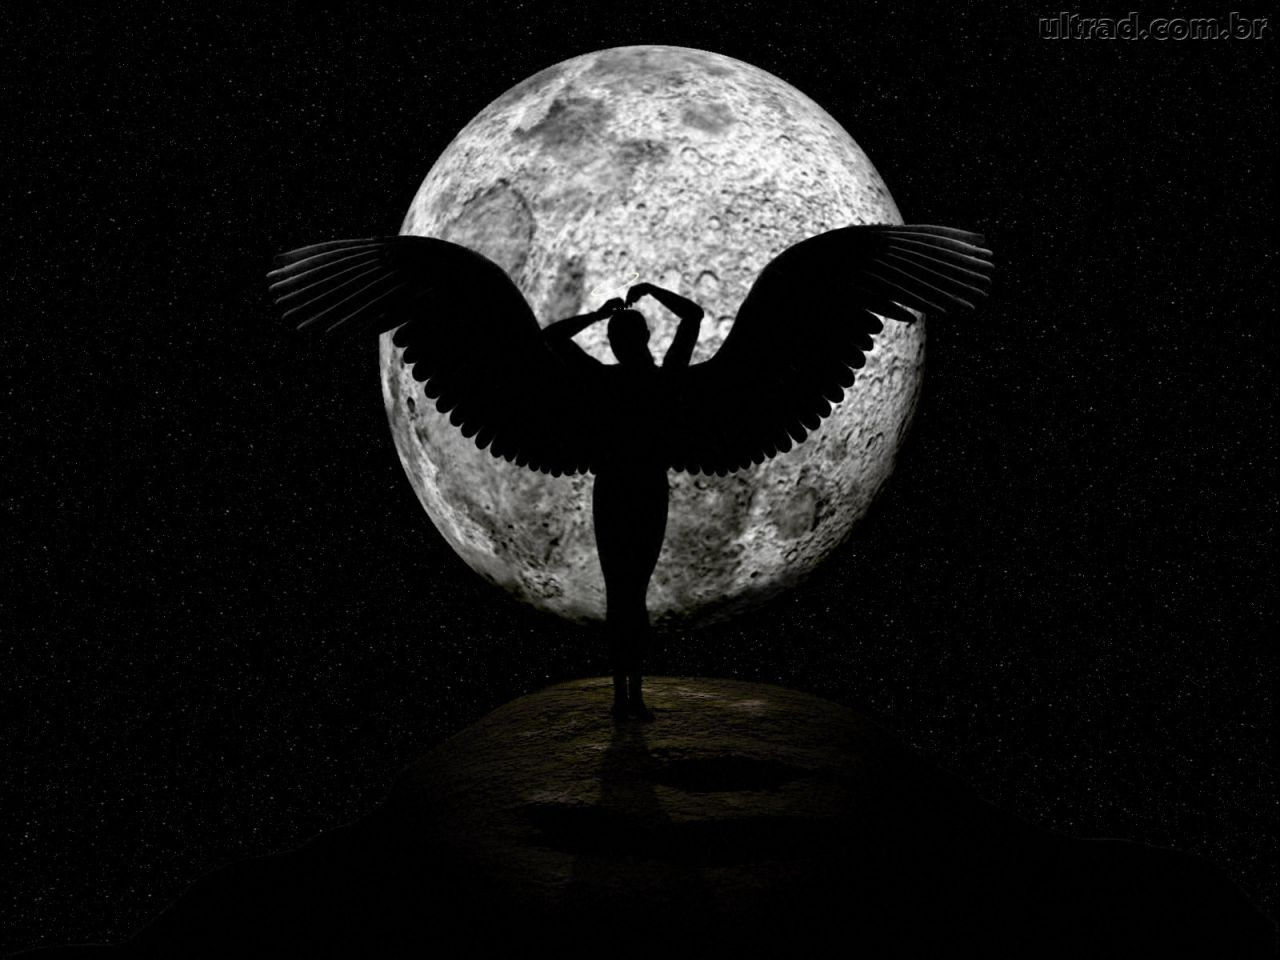 image Anjo da noite night angel